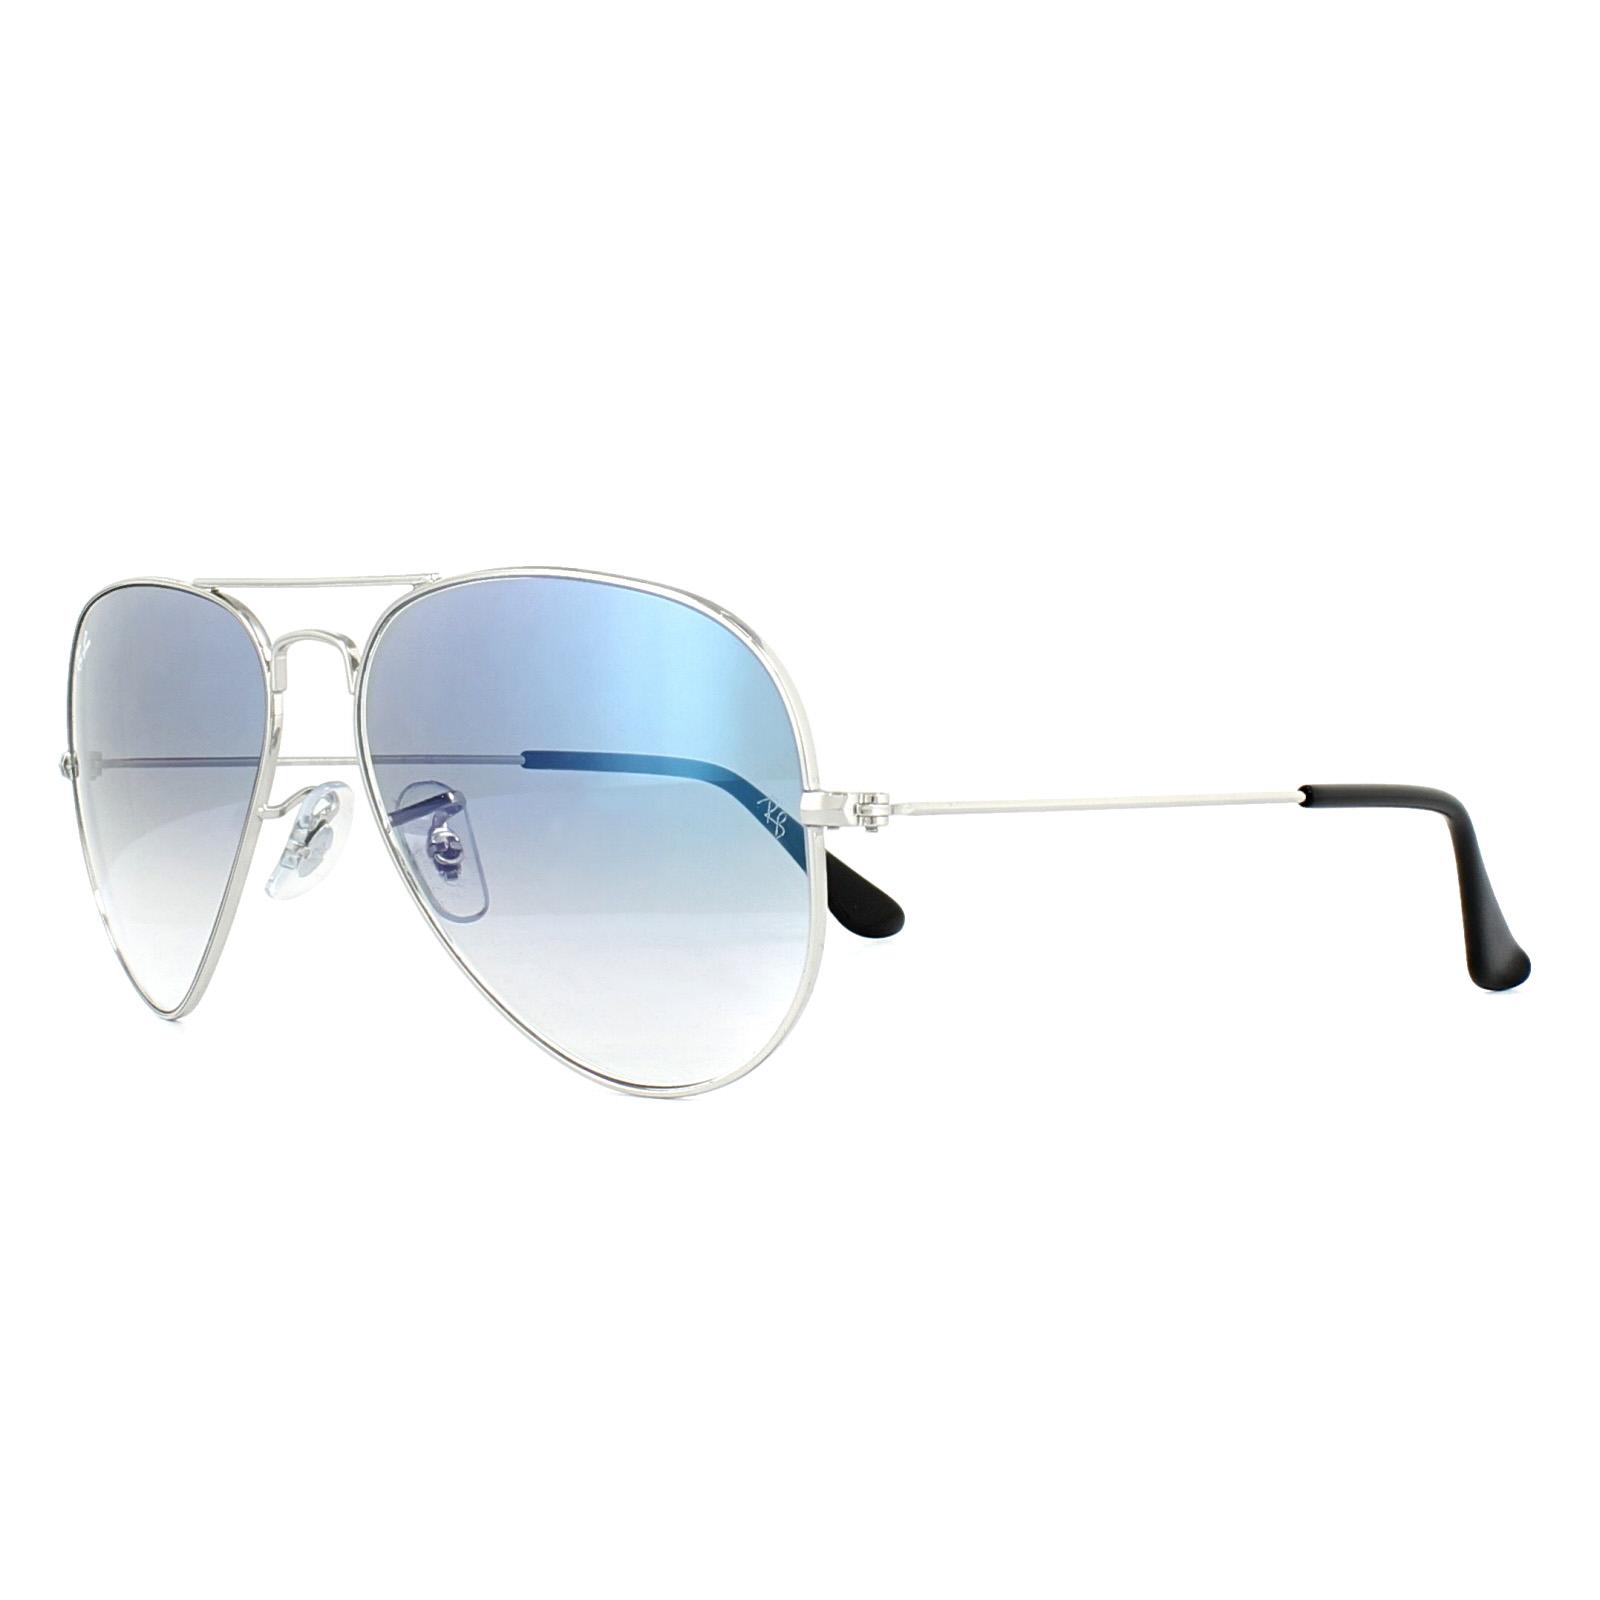 af4bf8e1a CENTINELA Gafas de sol de Ray-Ban Aviator 3025 Silver degradado luz azul  003/3F